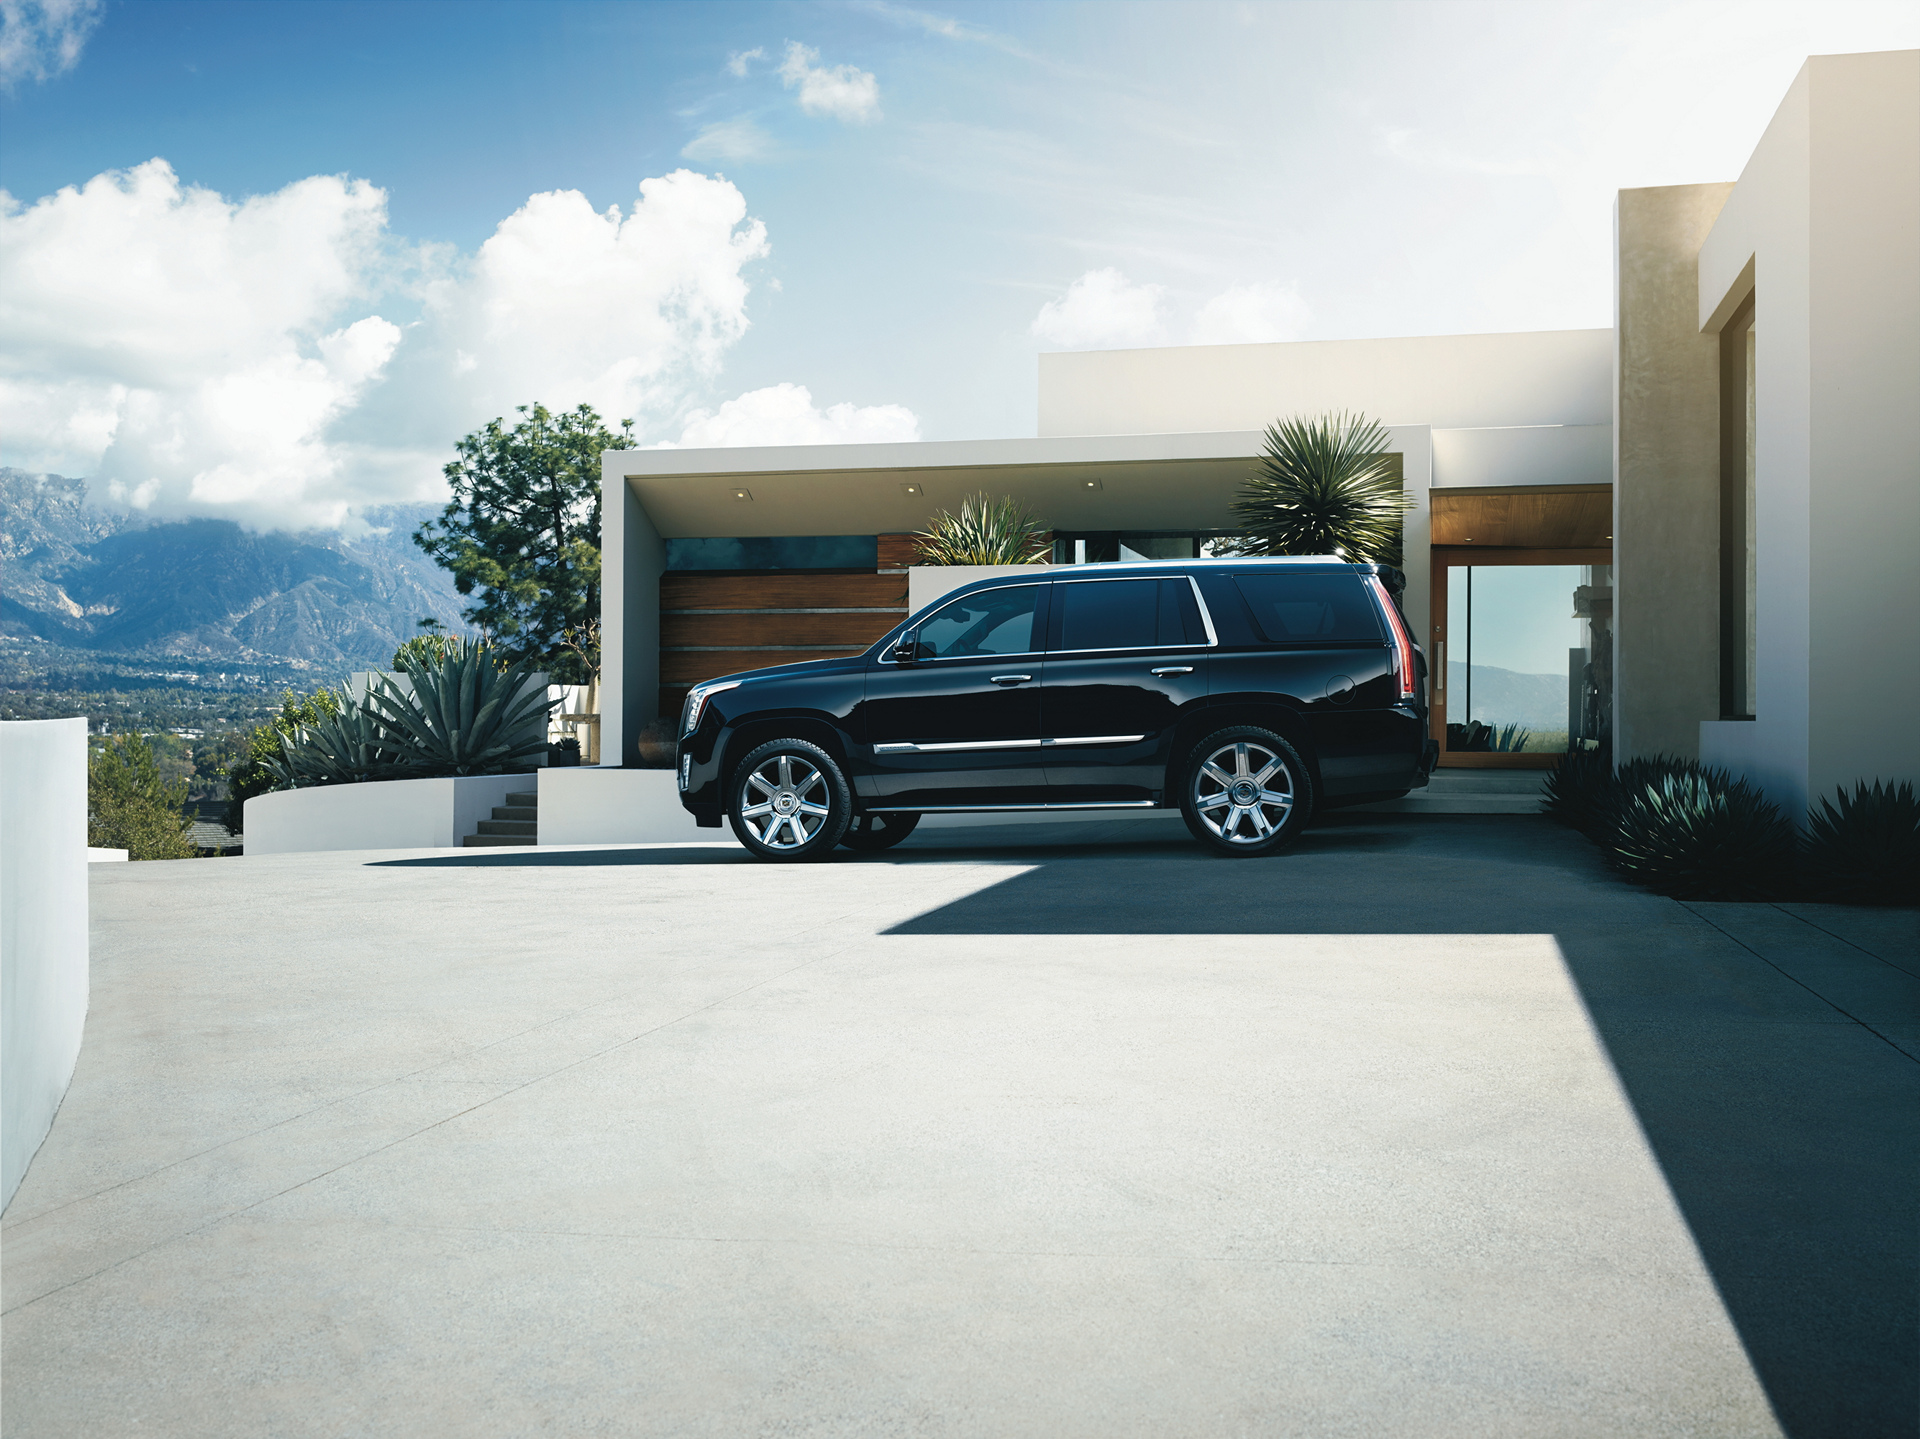 2016 Cadillac Escalade © General Motors